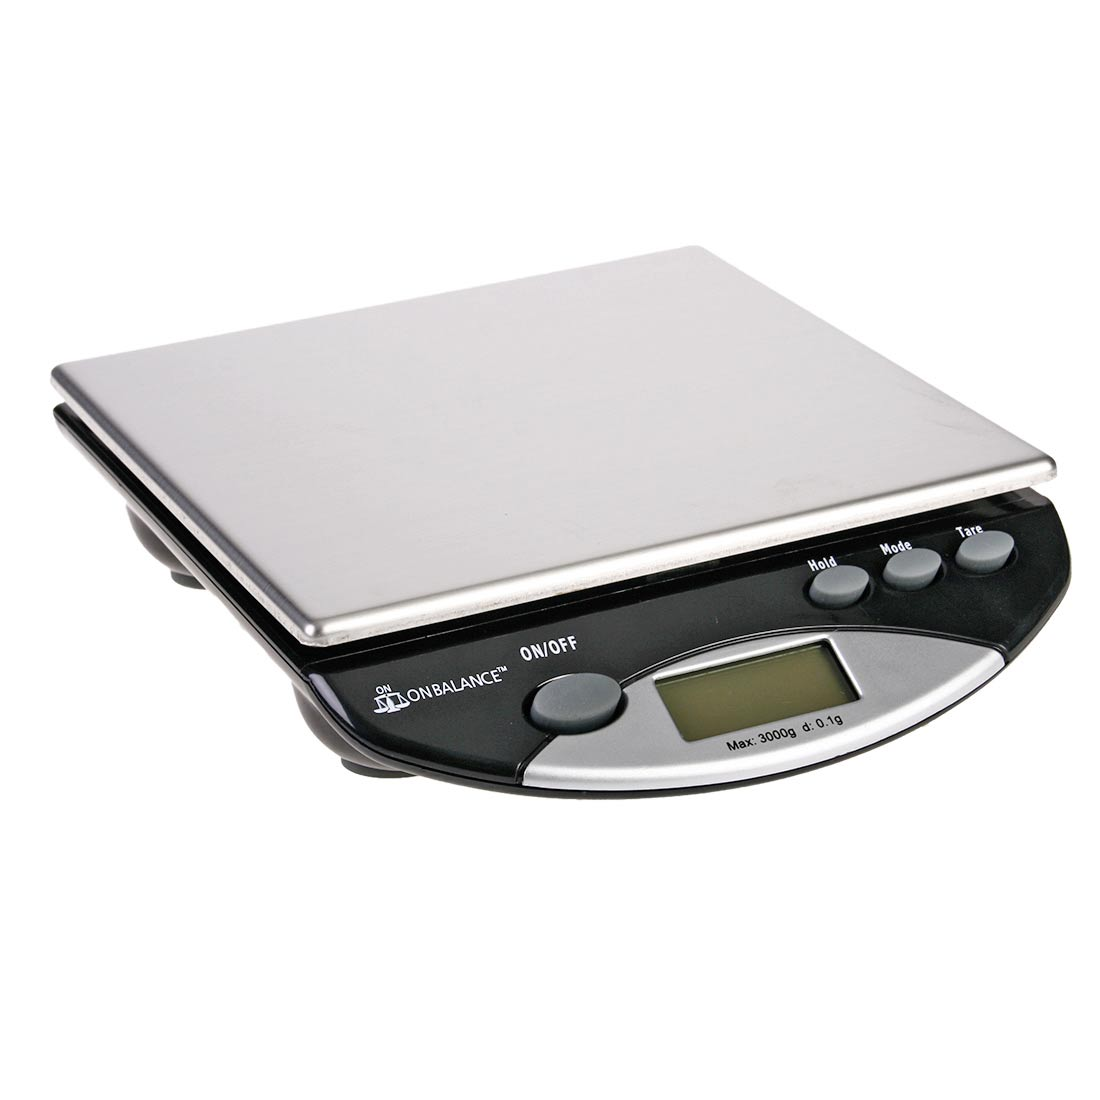 acheter balance american weigh balances de pr cision 1kg balance divers. Black Bedroom Furniture Sets. Home Design Ideas